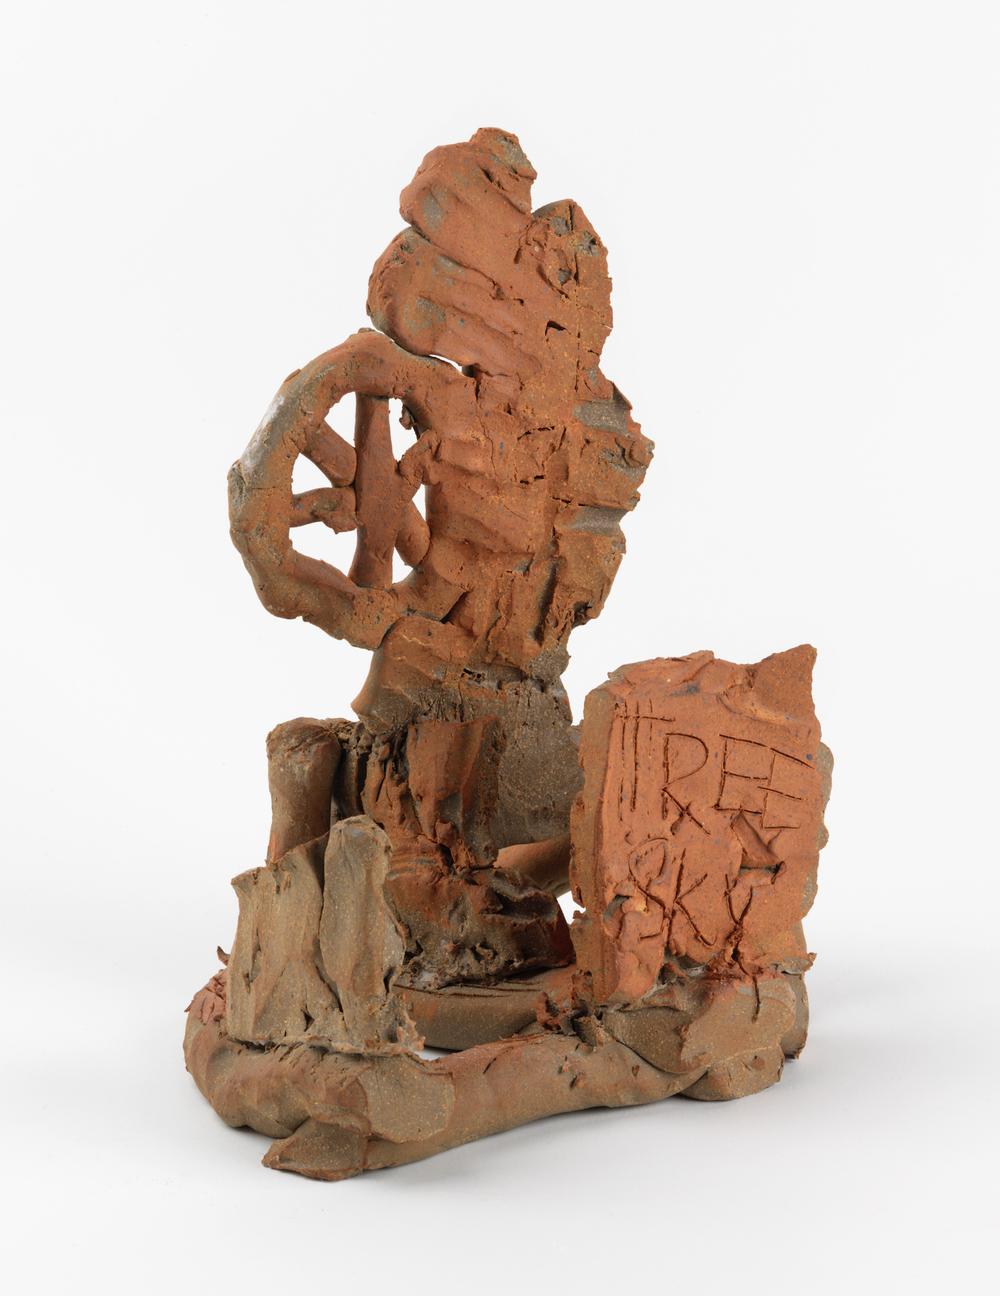 William J. O'Brien  Untitled  2011 Glazed ceramic 12h x 9 ¼w x 8 ½d in WOB730